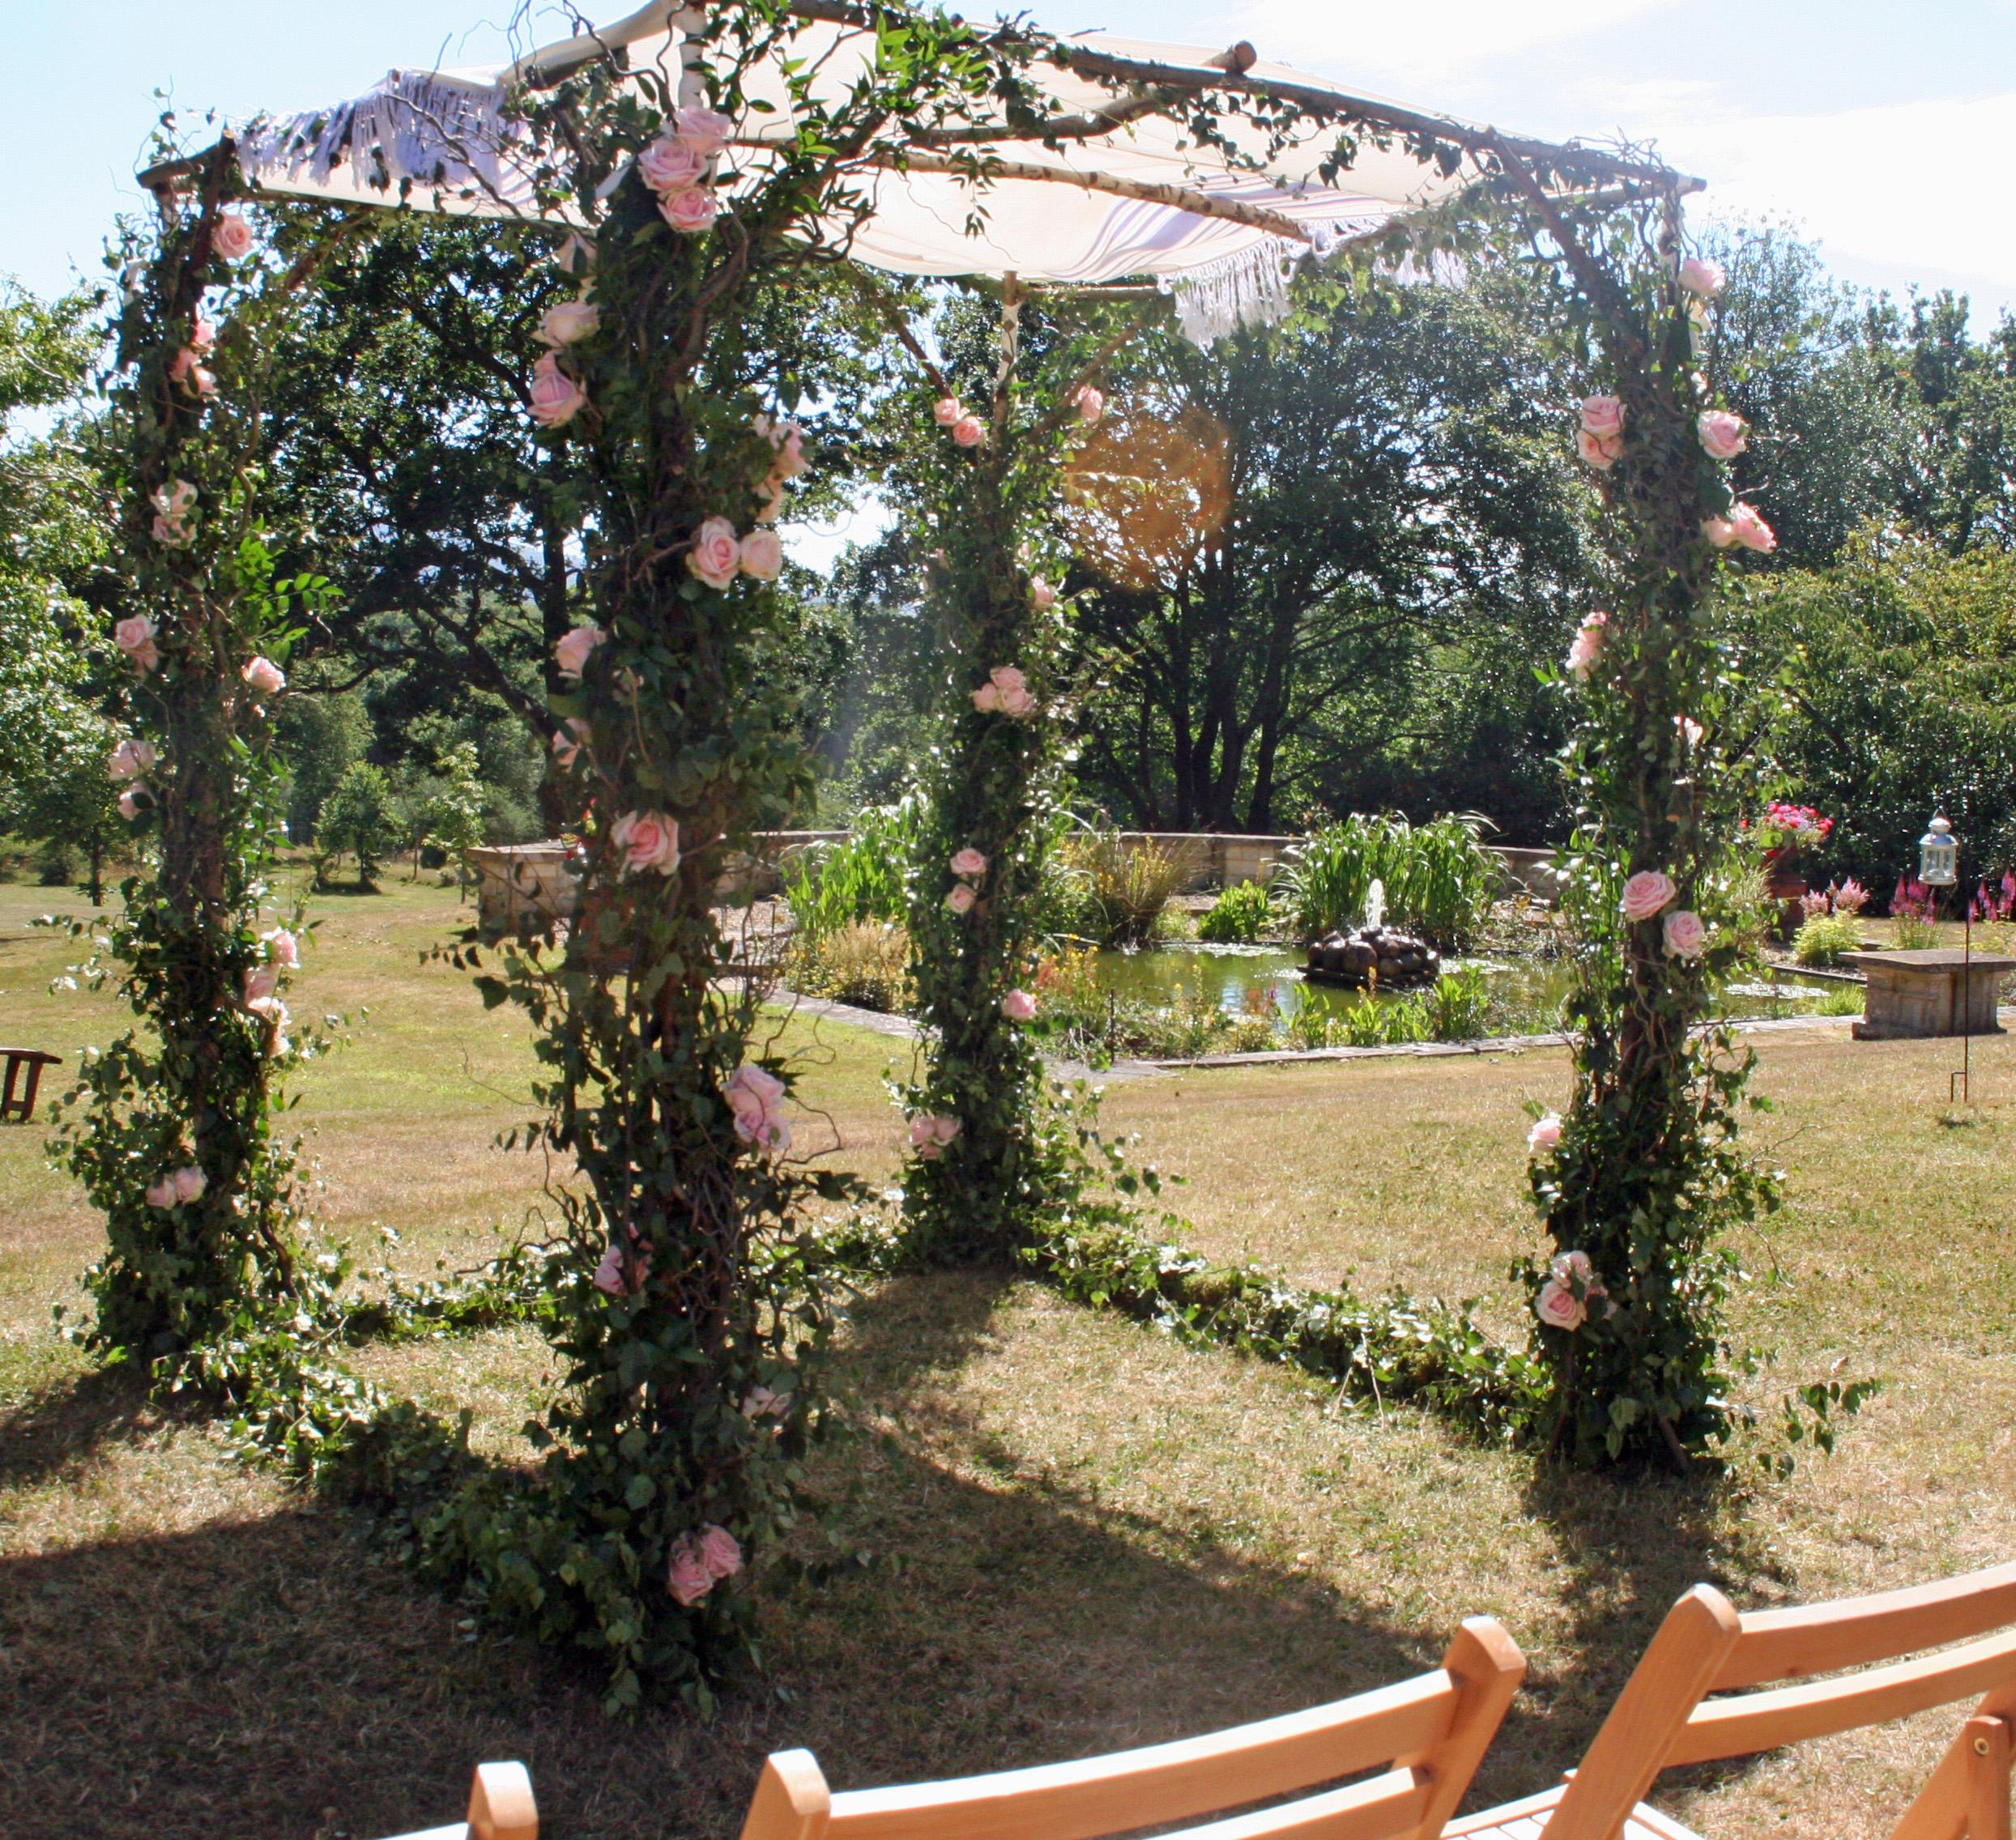 Rose-strewn chuppah by Mary Jane Vaughan flowers